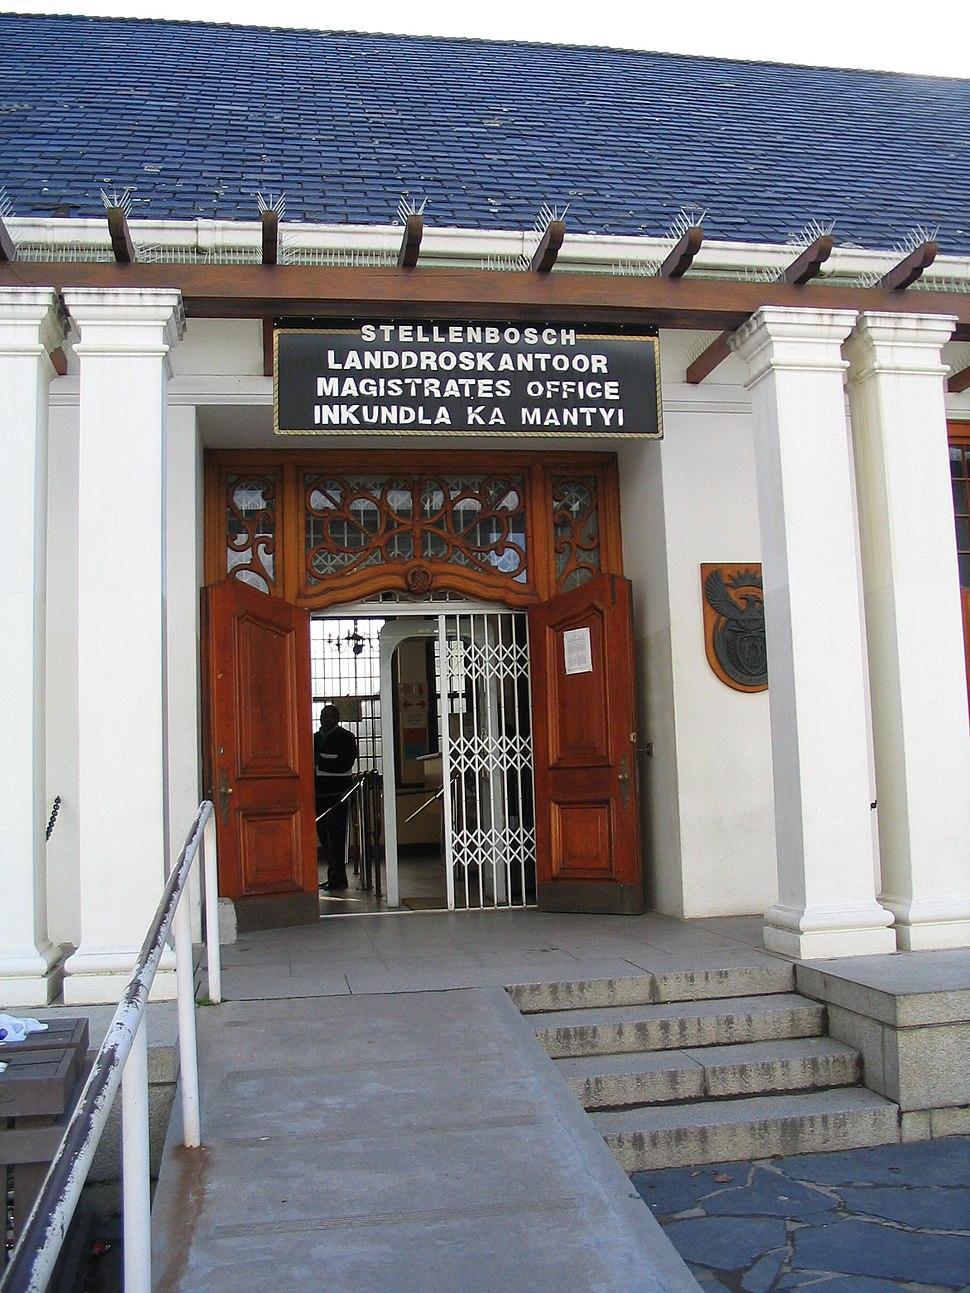 Stellenbosch Magistrate's Office (entrance)